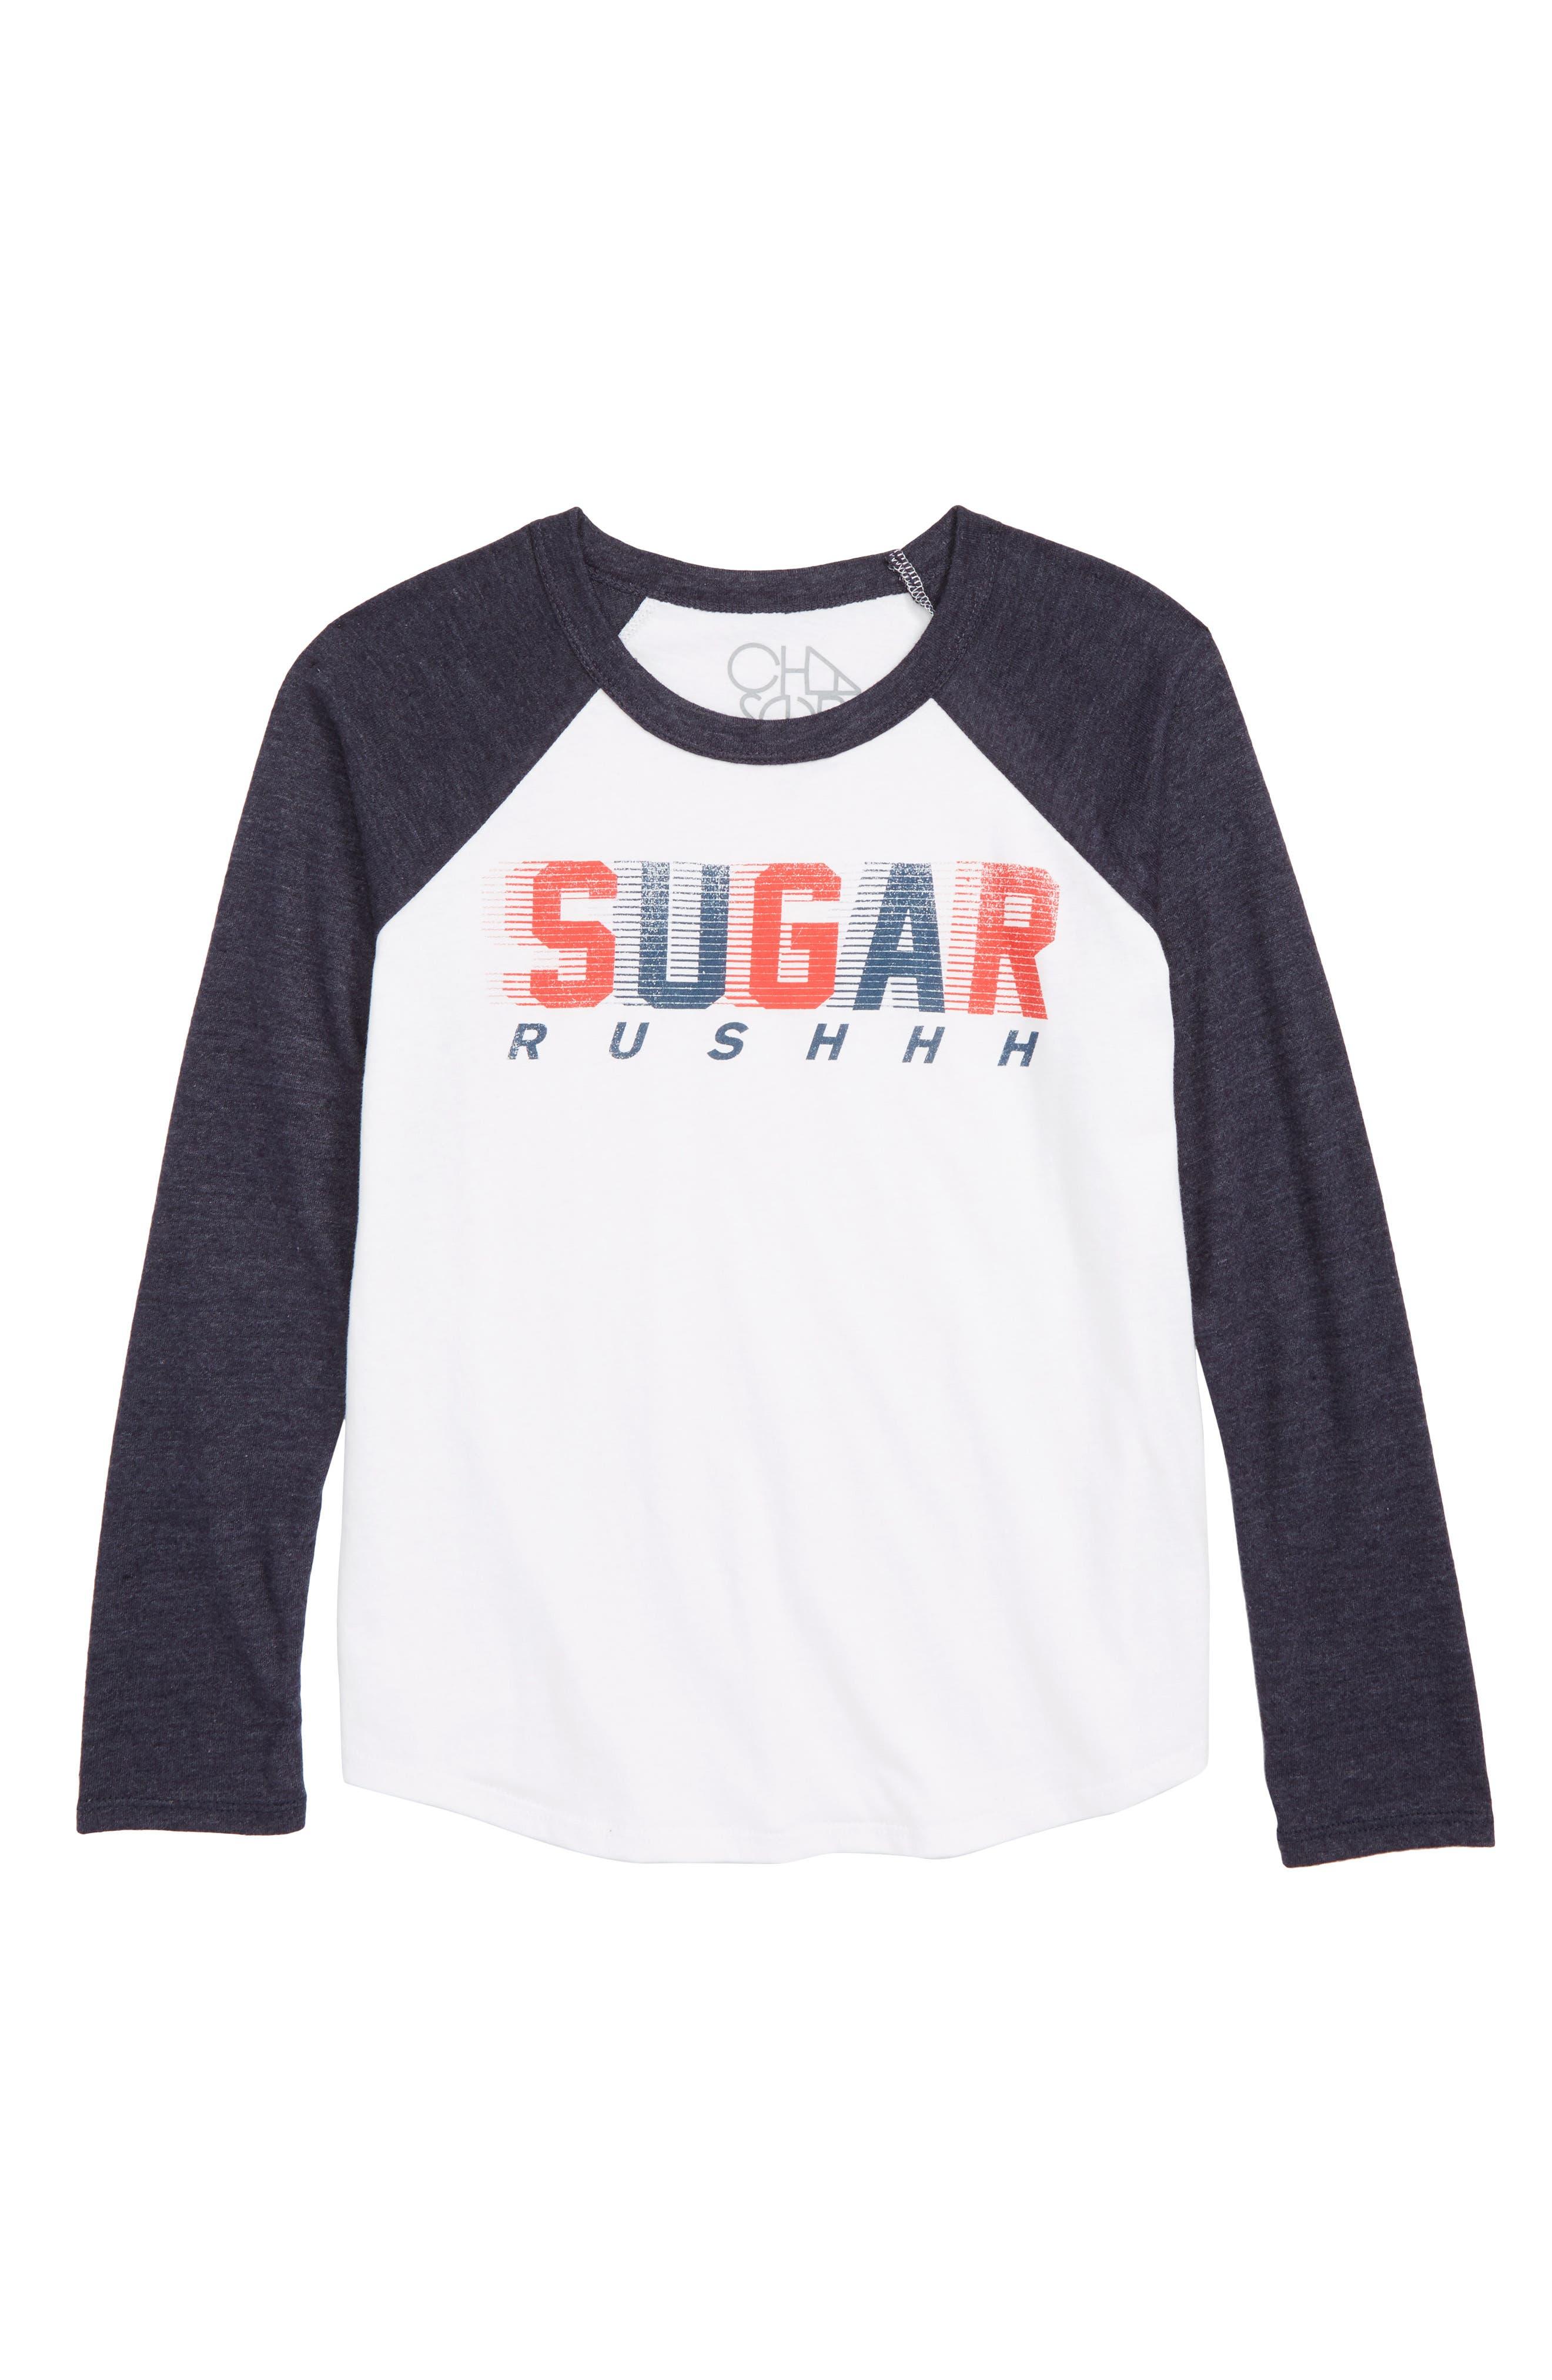 CHASER,                             Sugar Rush Graphic T-Shirt,                             Main thumbnail 1, color,                             WHITE / AVALON